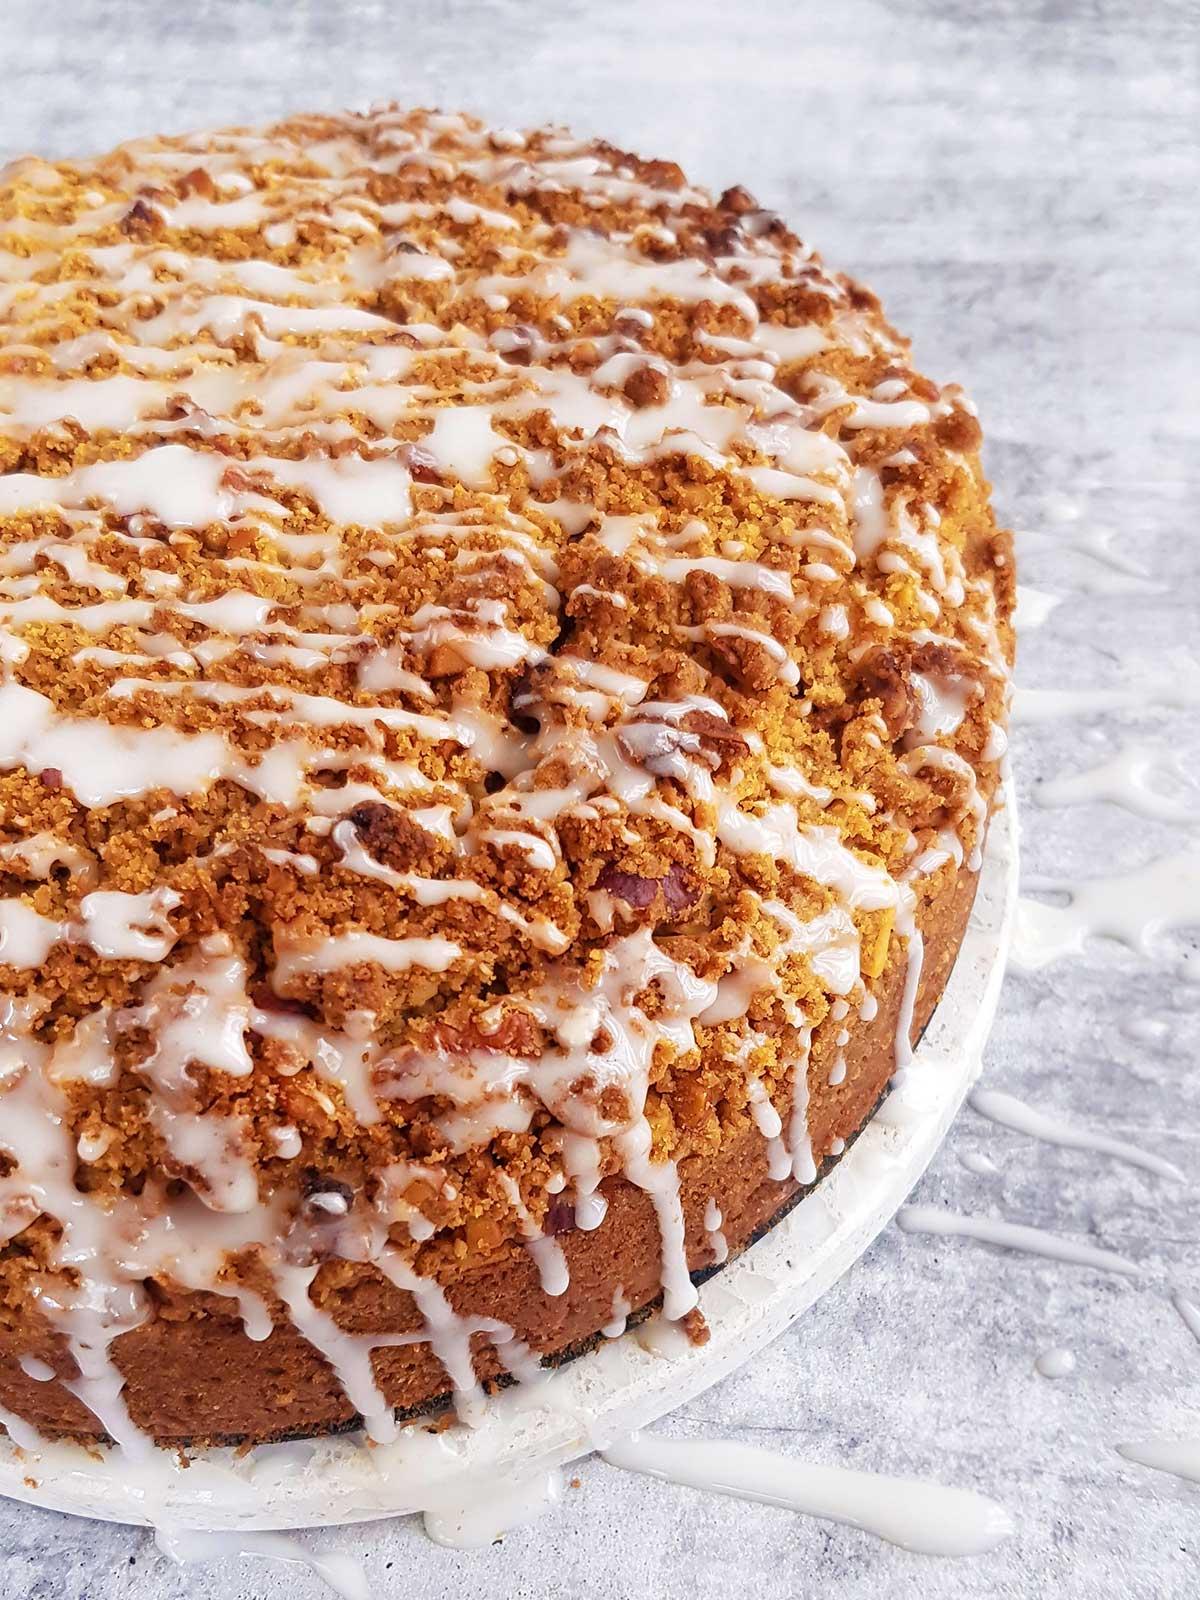 Vegan Coffee cake with Cinnamon Streusel